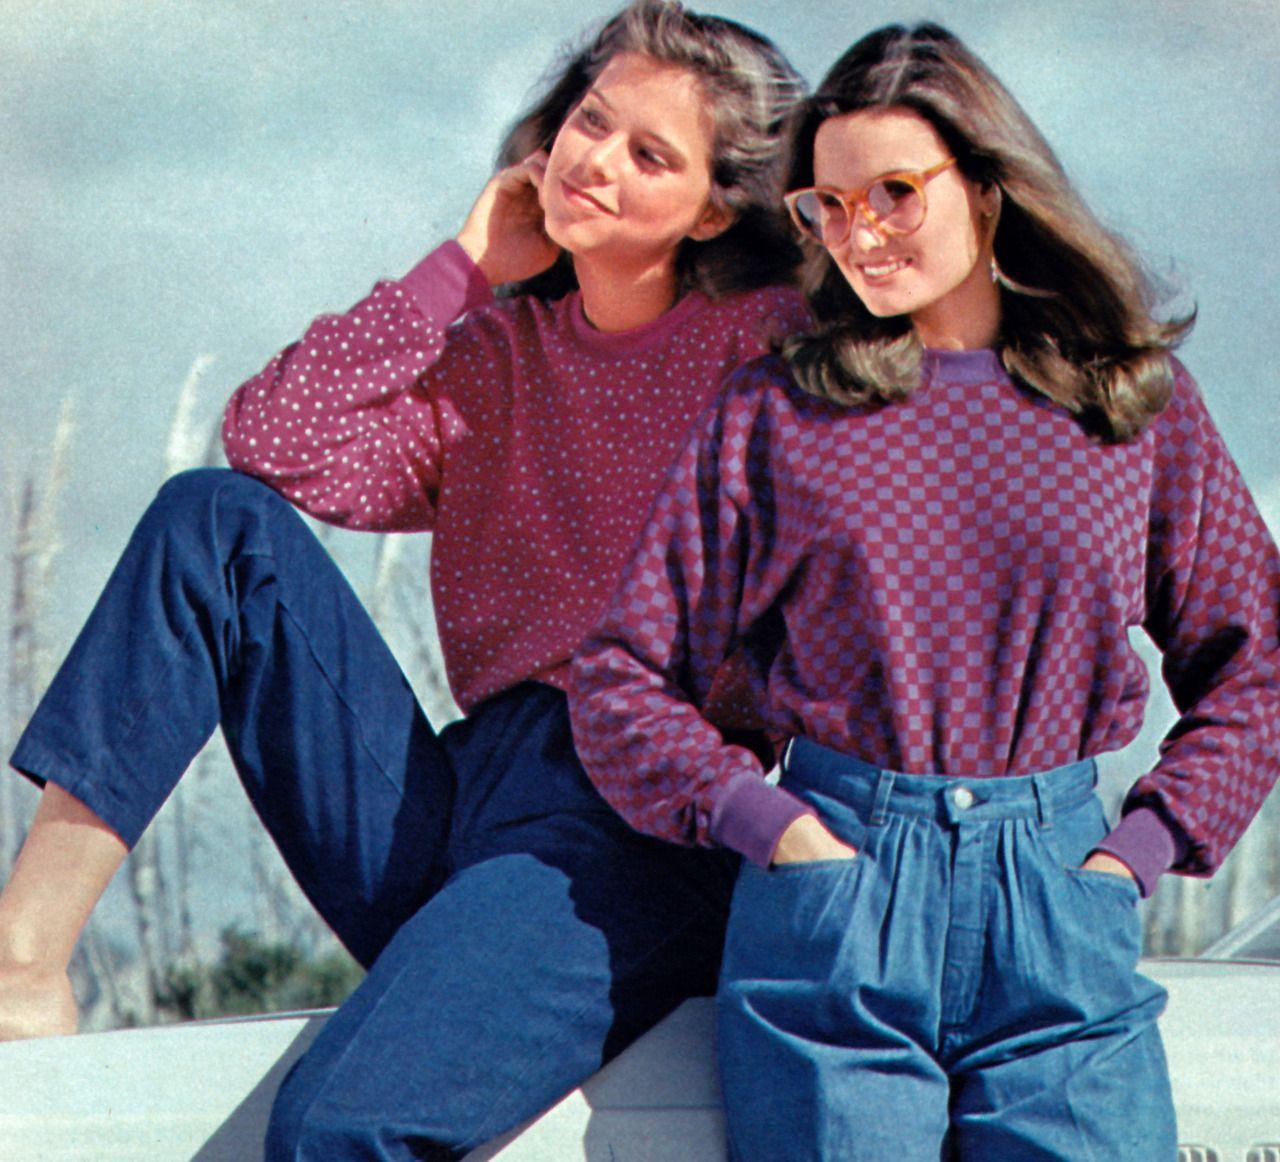 Мagazine Fashion 17 Only Sweet Girls: Cone Plushbottoms, Seventeen Magazine, April 1980.